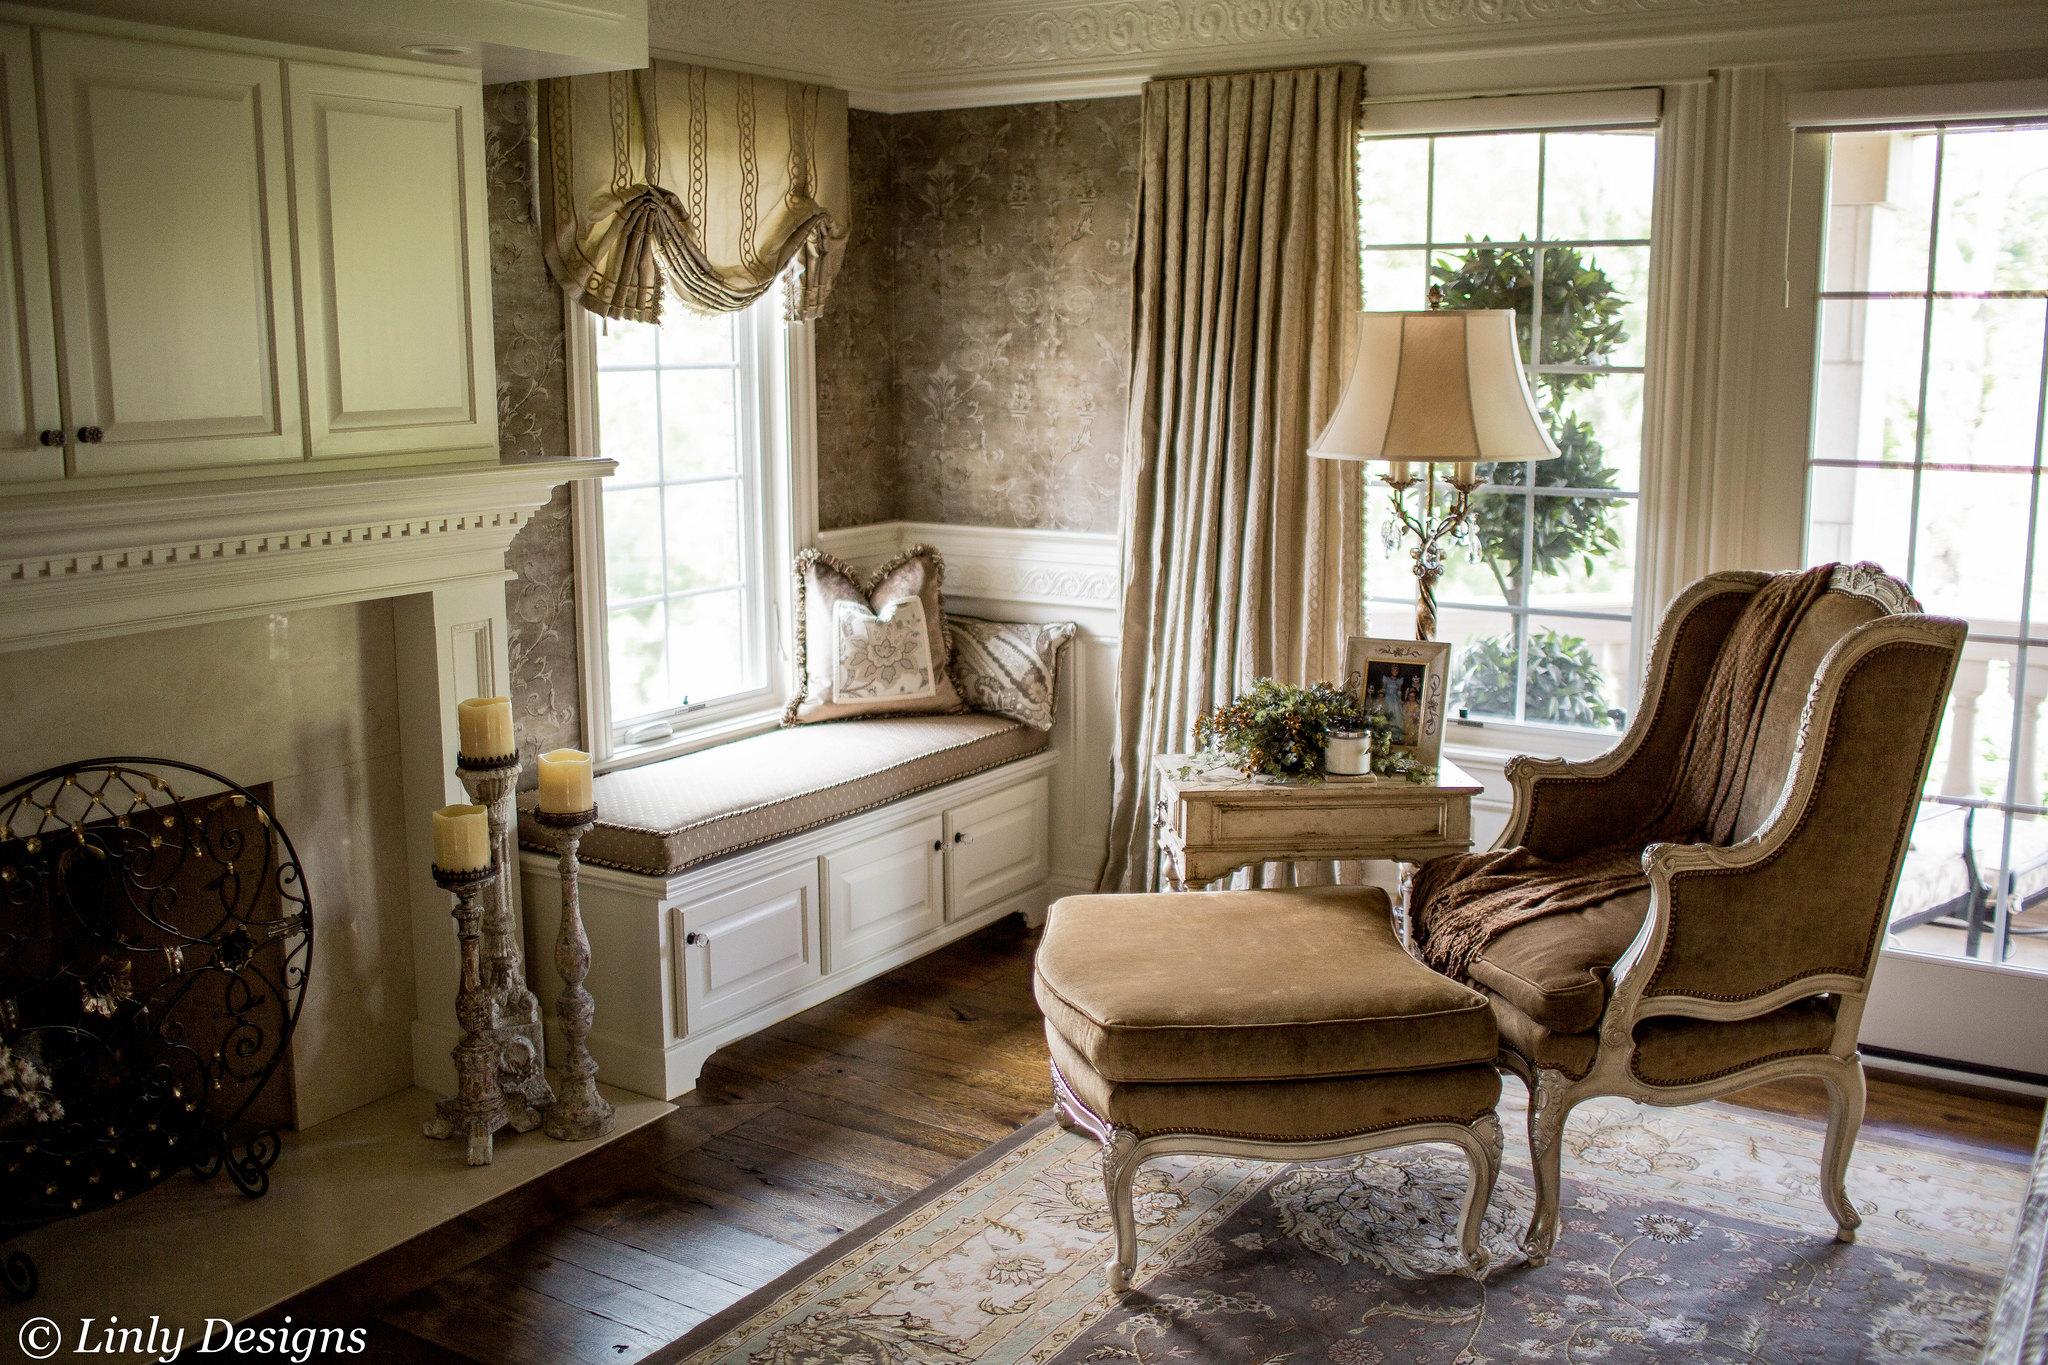 Custom Window Treatments and Accessories …